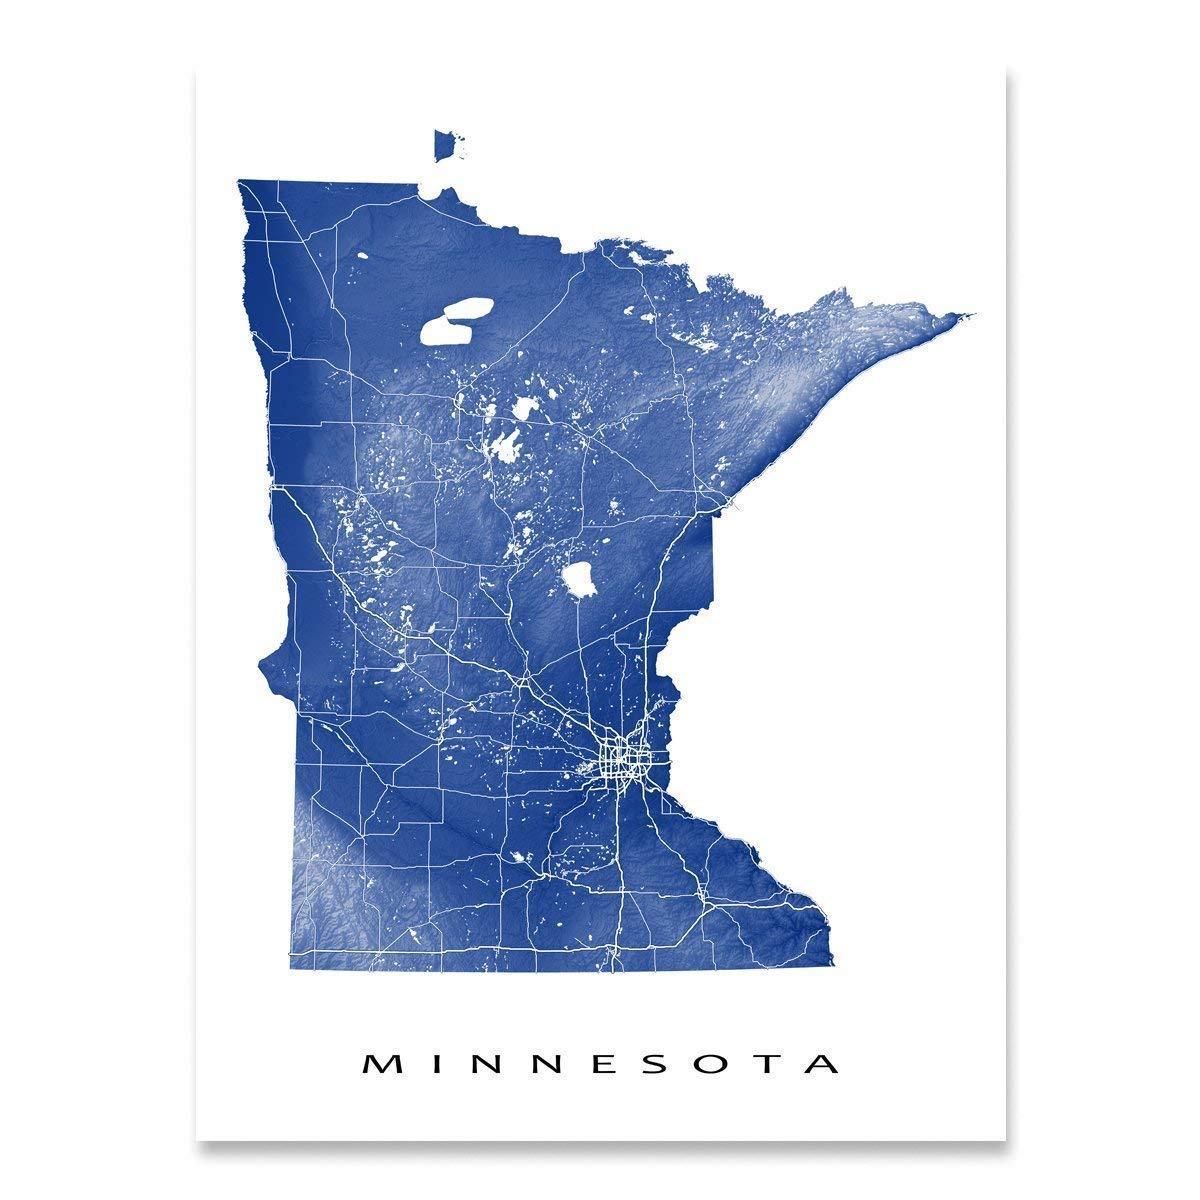 Amazon.com: Minnesota Map Print, MN State Art, USA ...